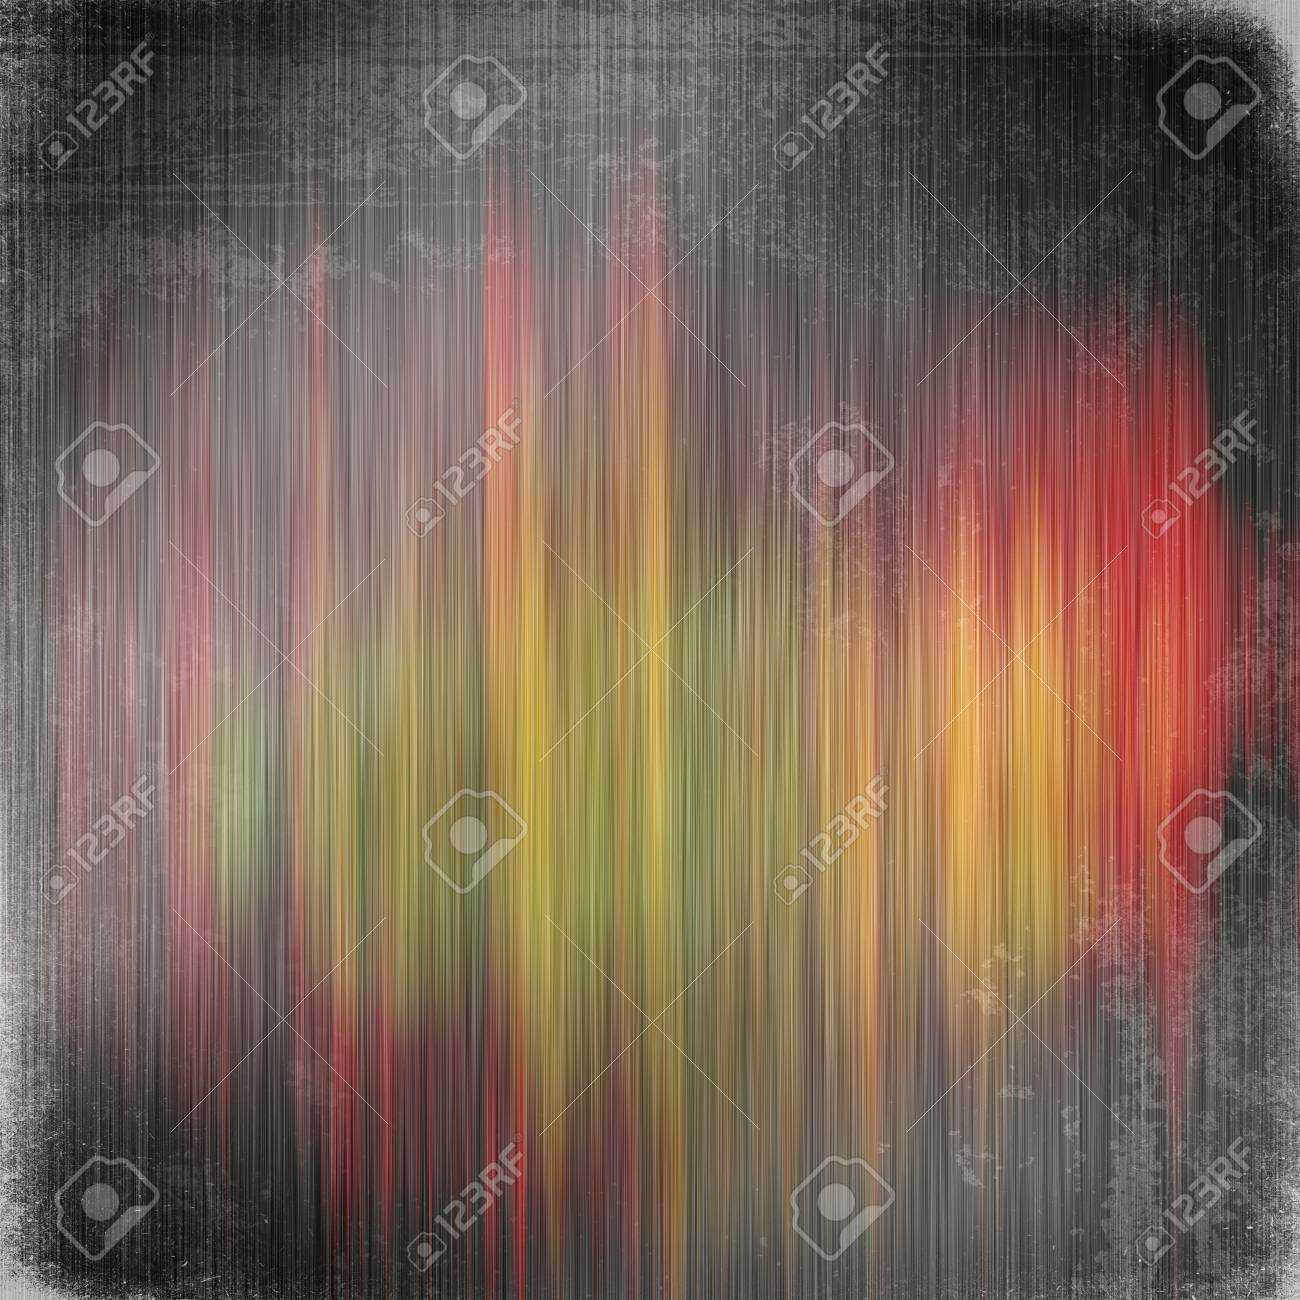 Brushed metal texture, grunge background Stock Photo - 15513184